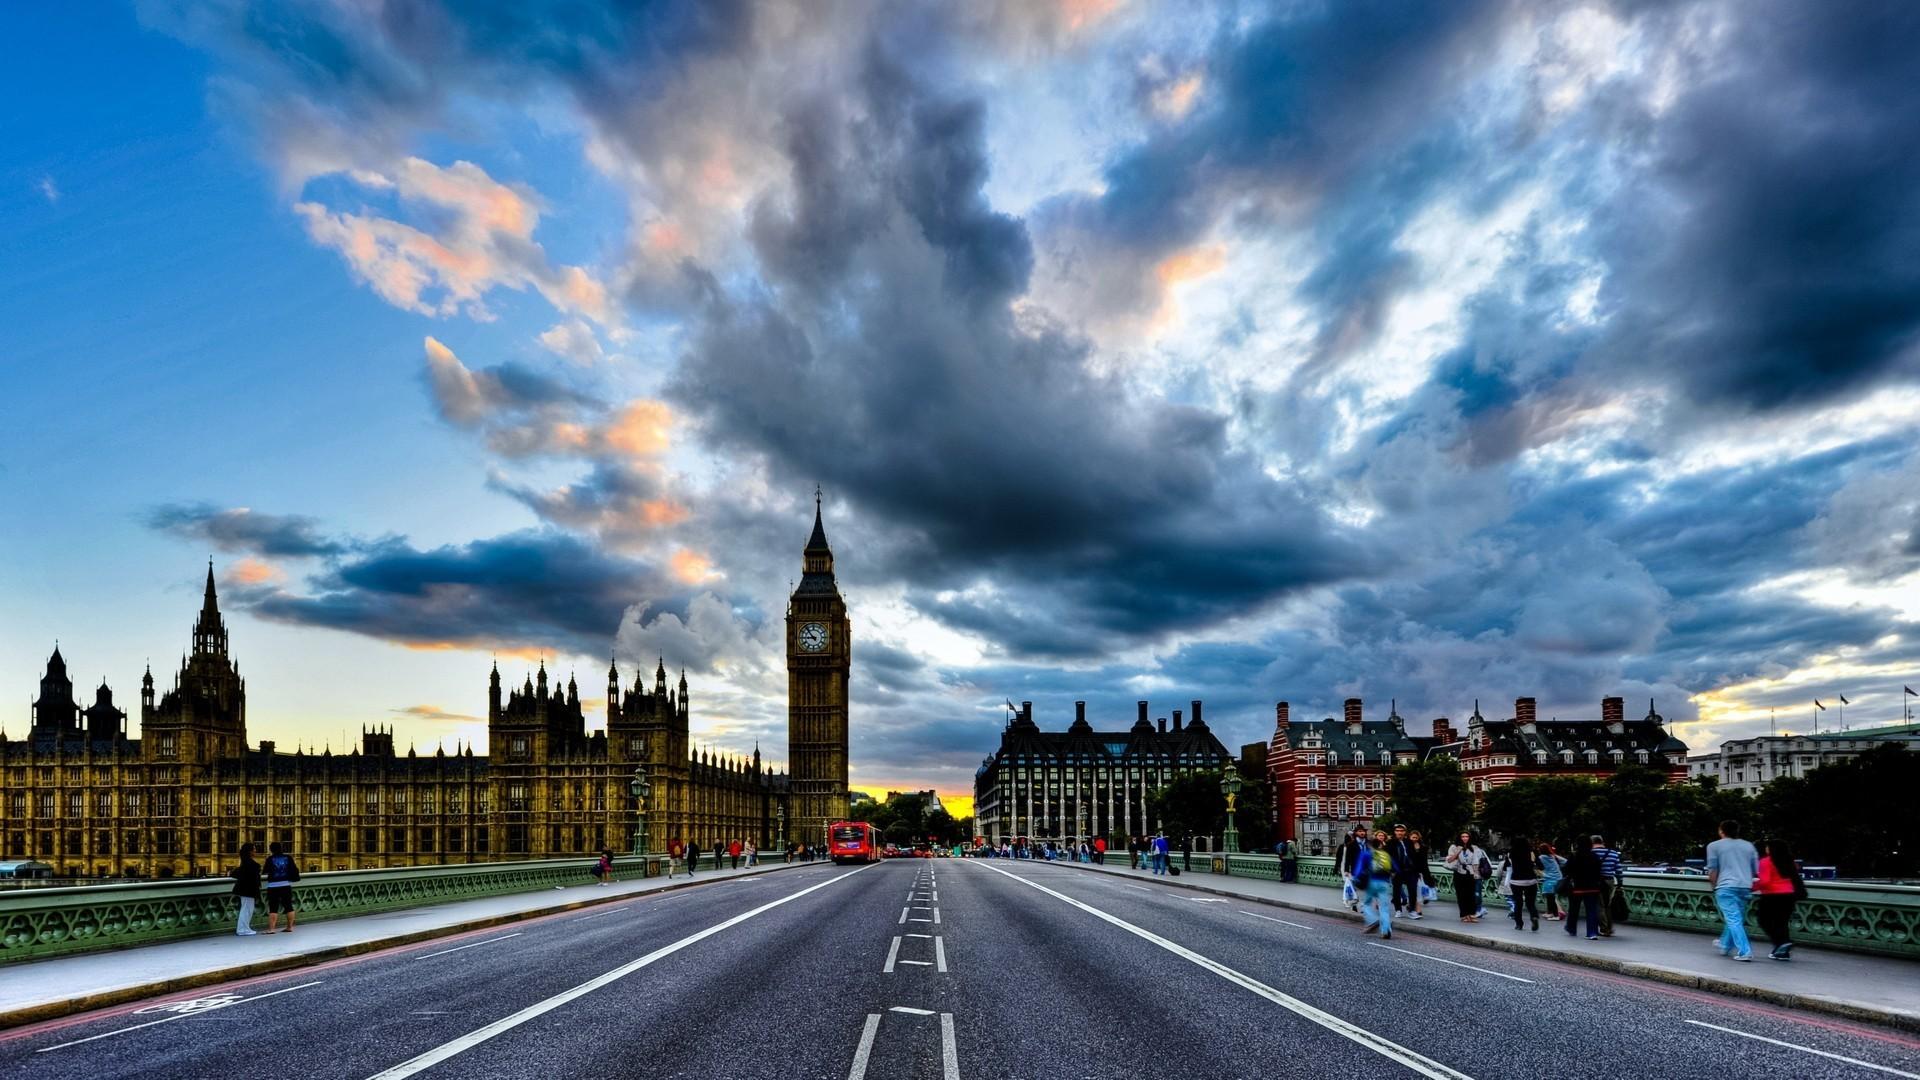 london ultra hd wallpaper 0002